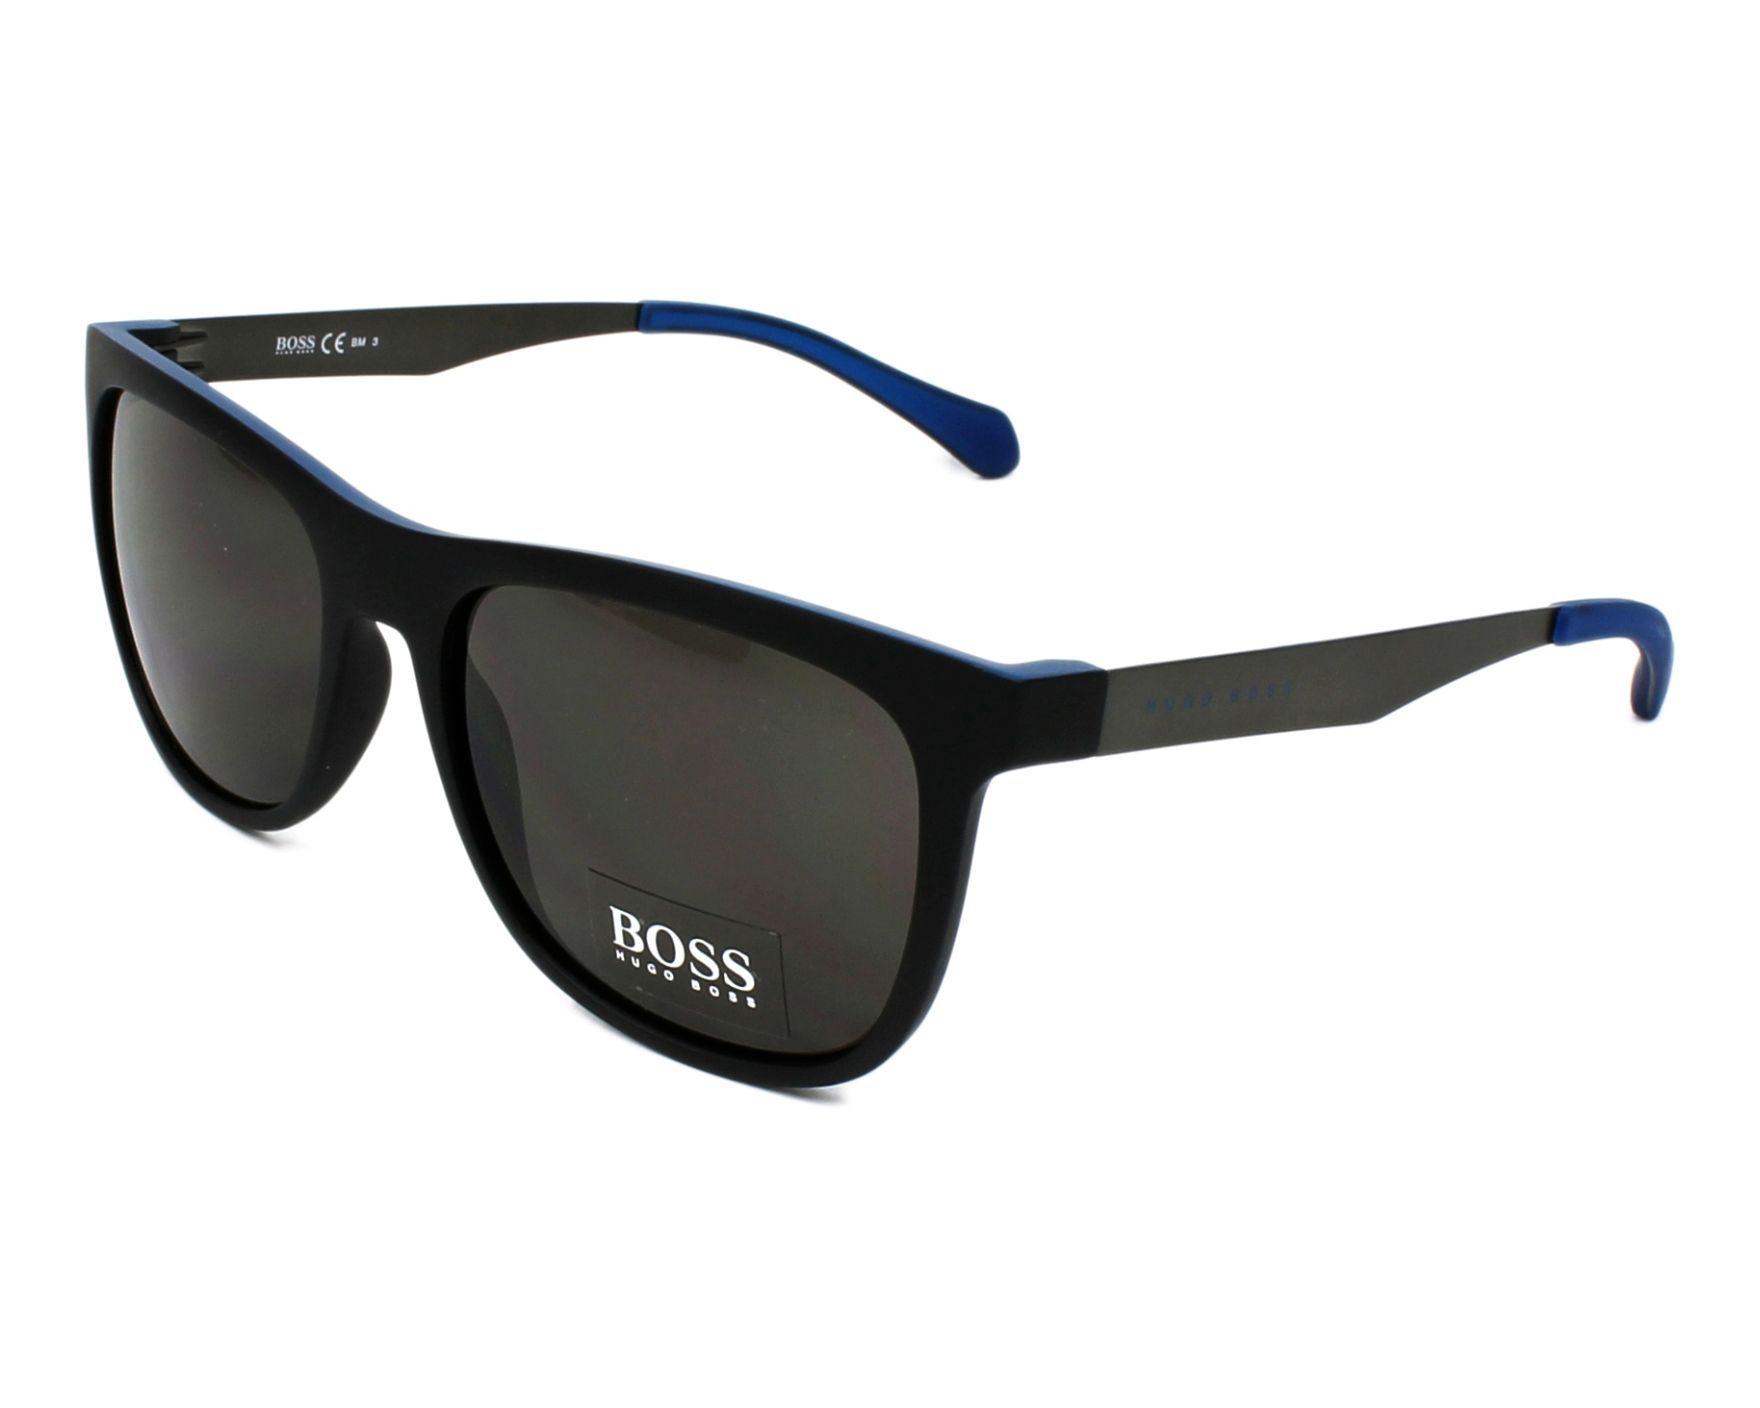 Hugo Boss 0868/S 0N2NR 55 - 18 145